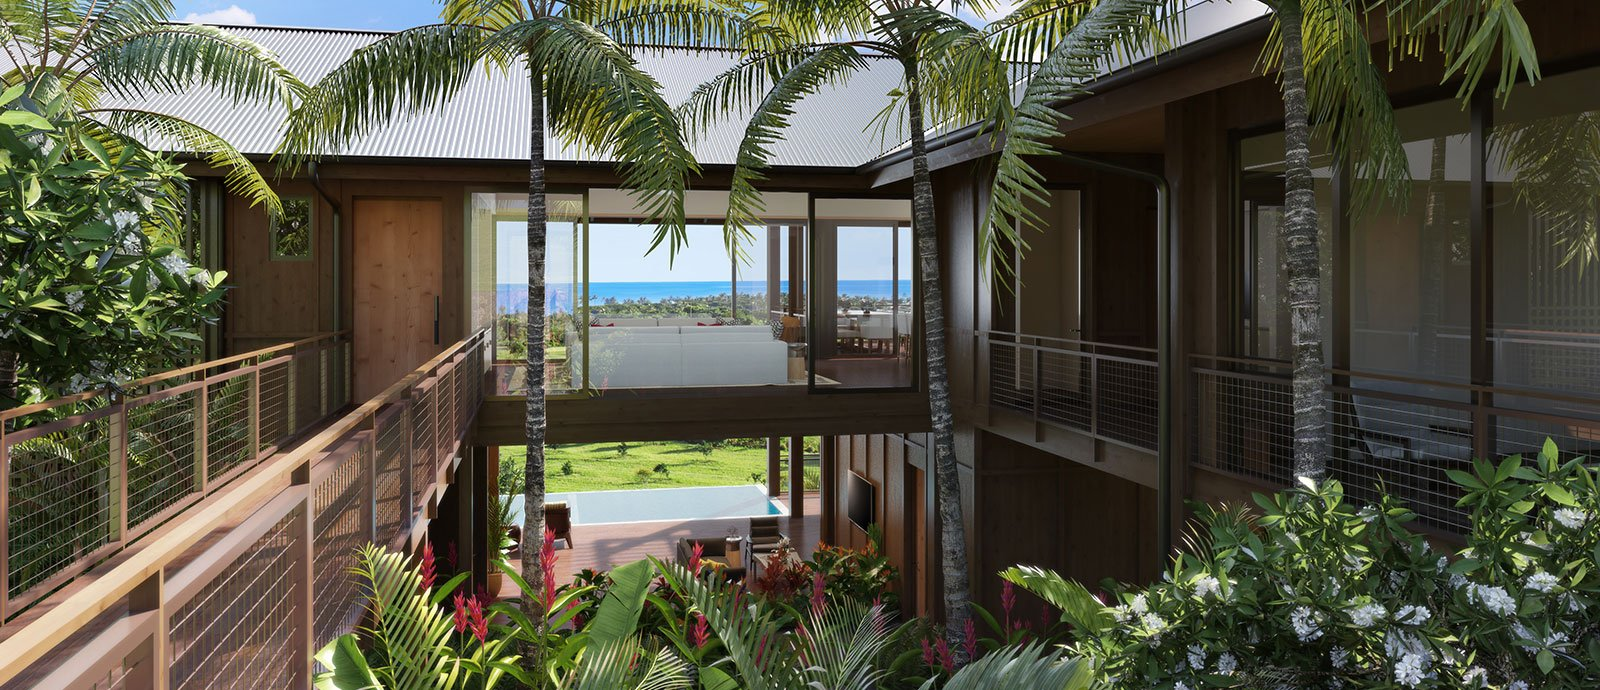 Entry Olson Kunding Custom Home #40 - Kukuiula Real Estate Kauai